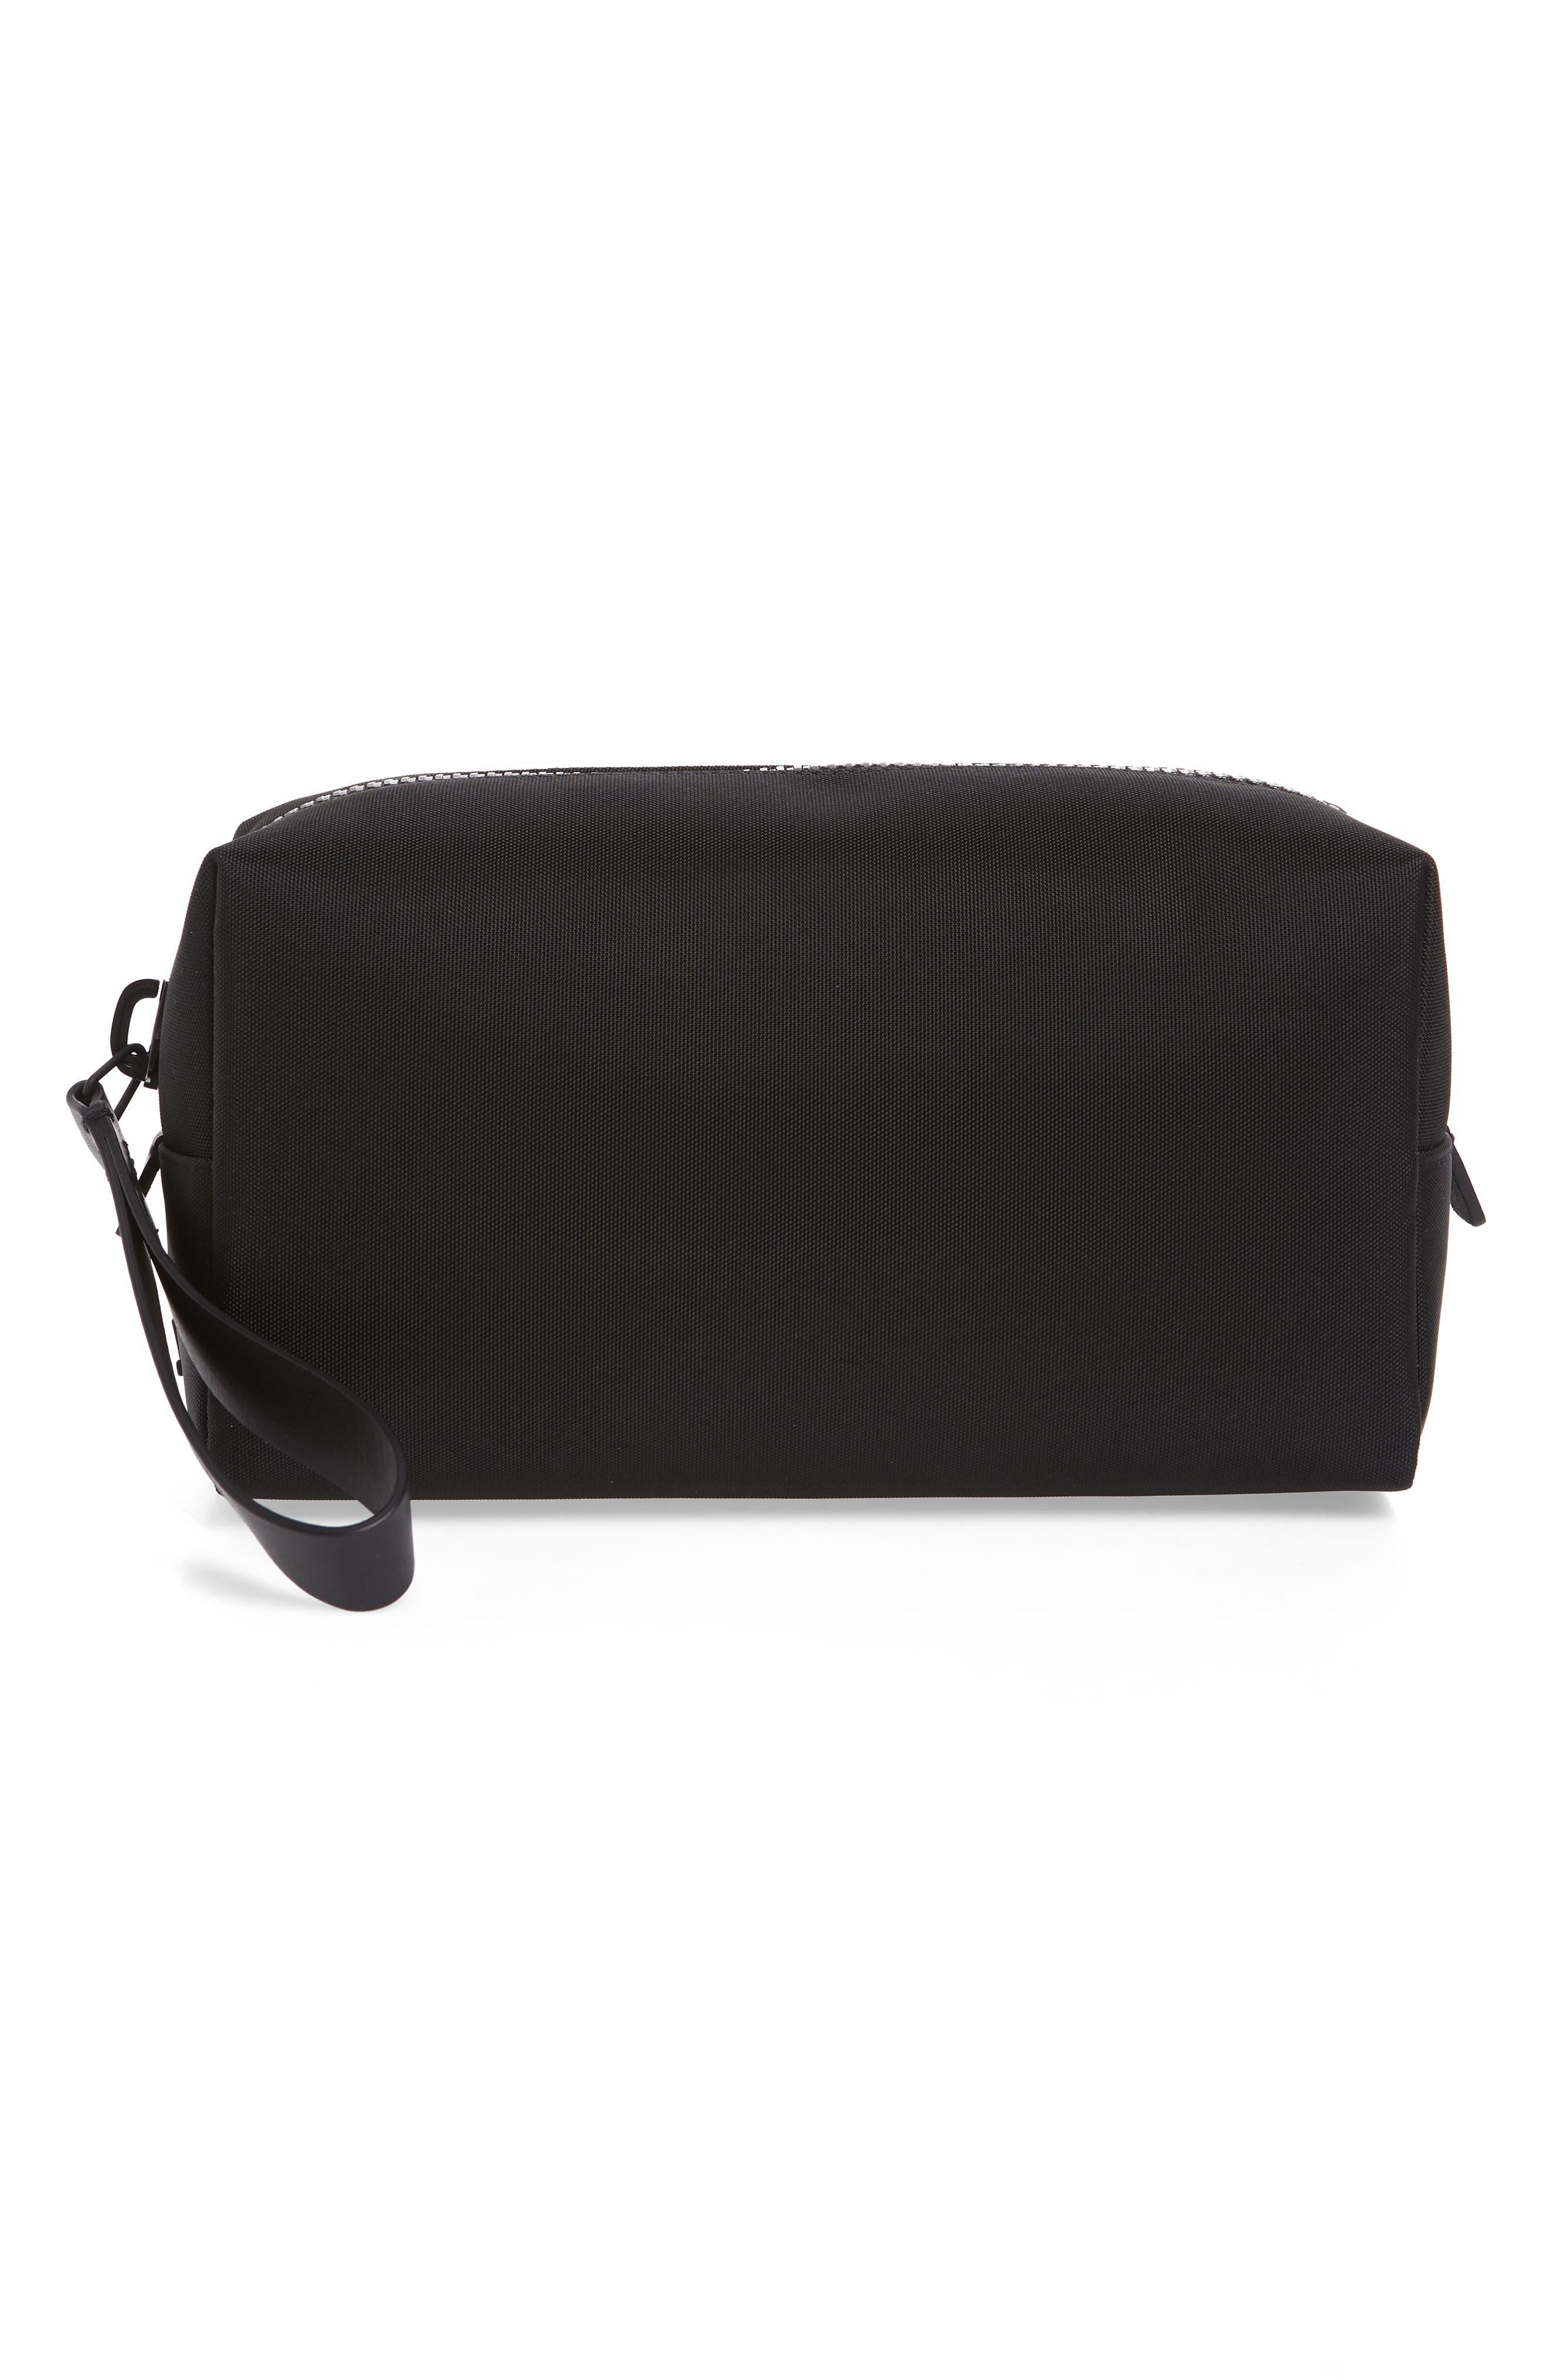 TROUBADOUR Nylon Dopp Kit in Black Nylon/ Black Leather